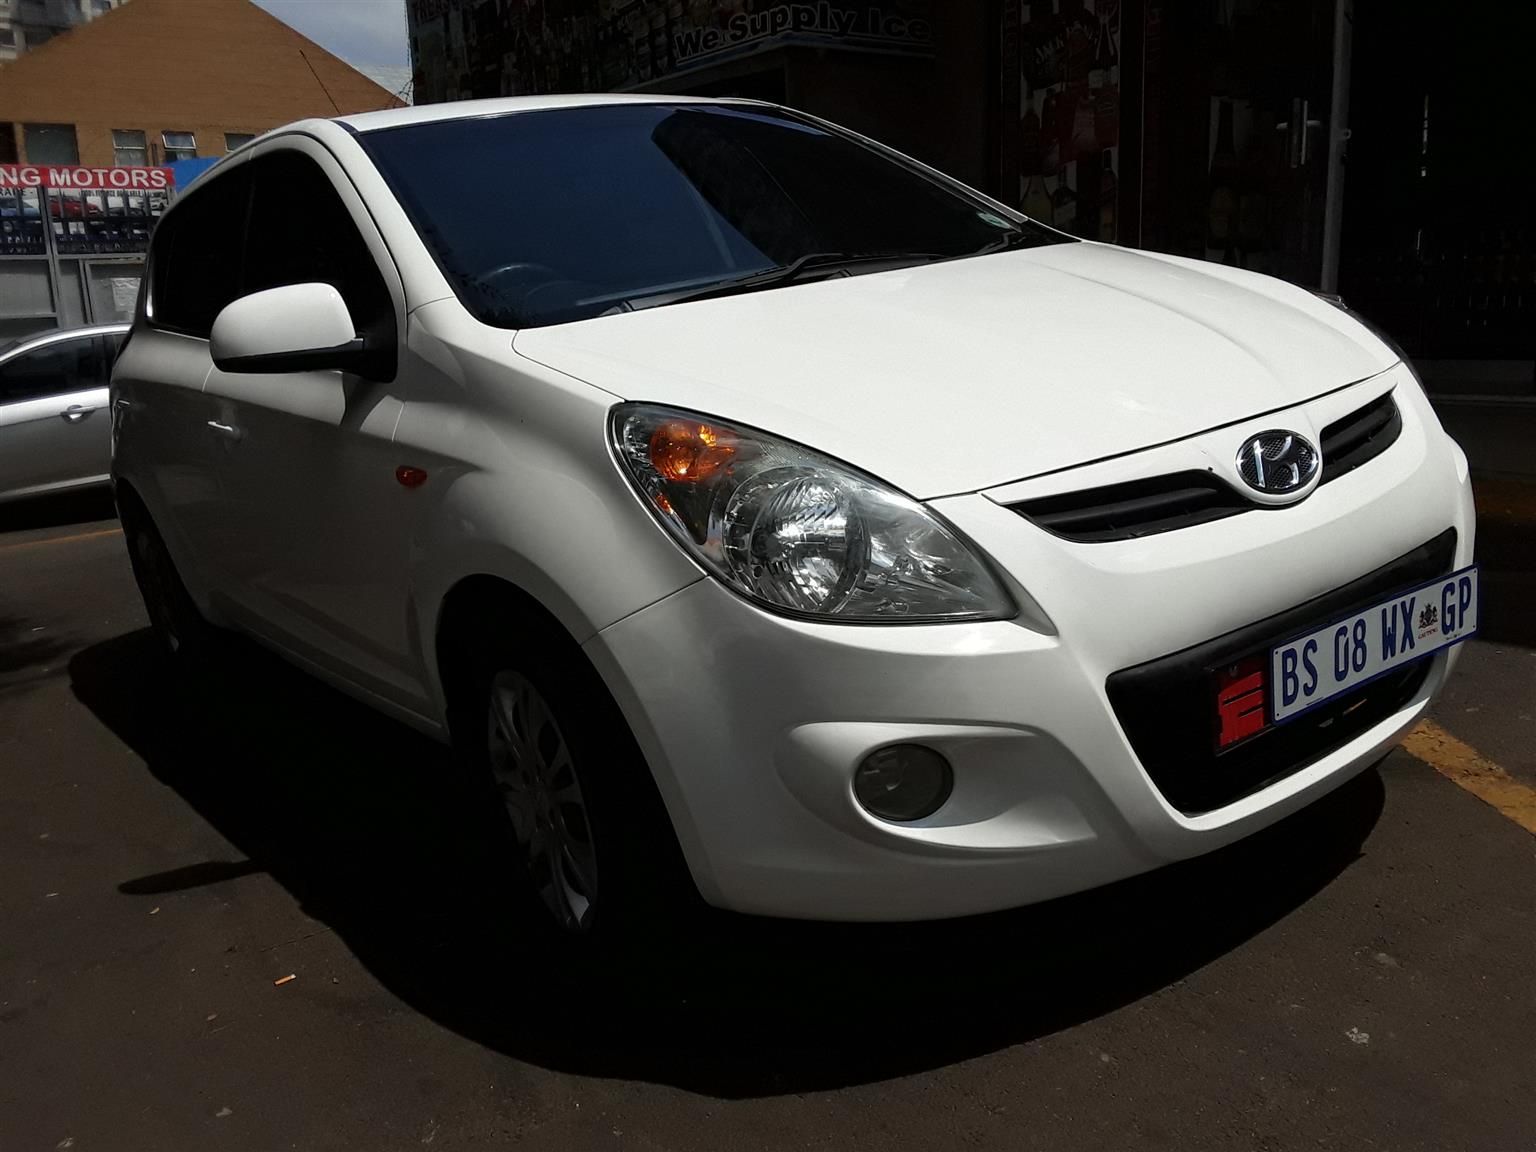 2012 Hyundai i20 1.4 GL auto